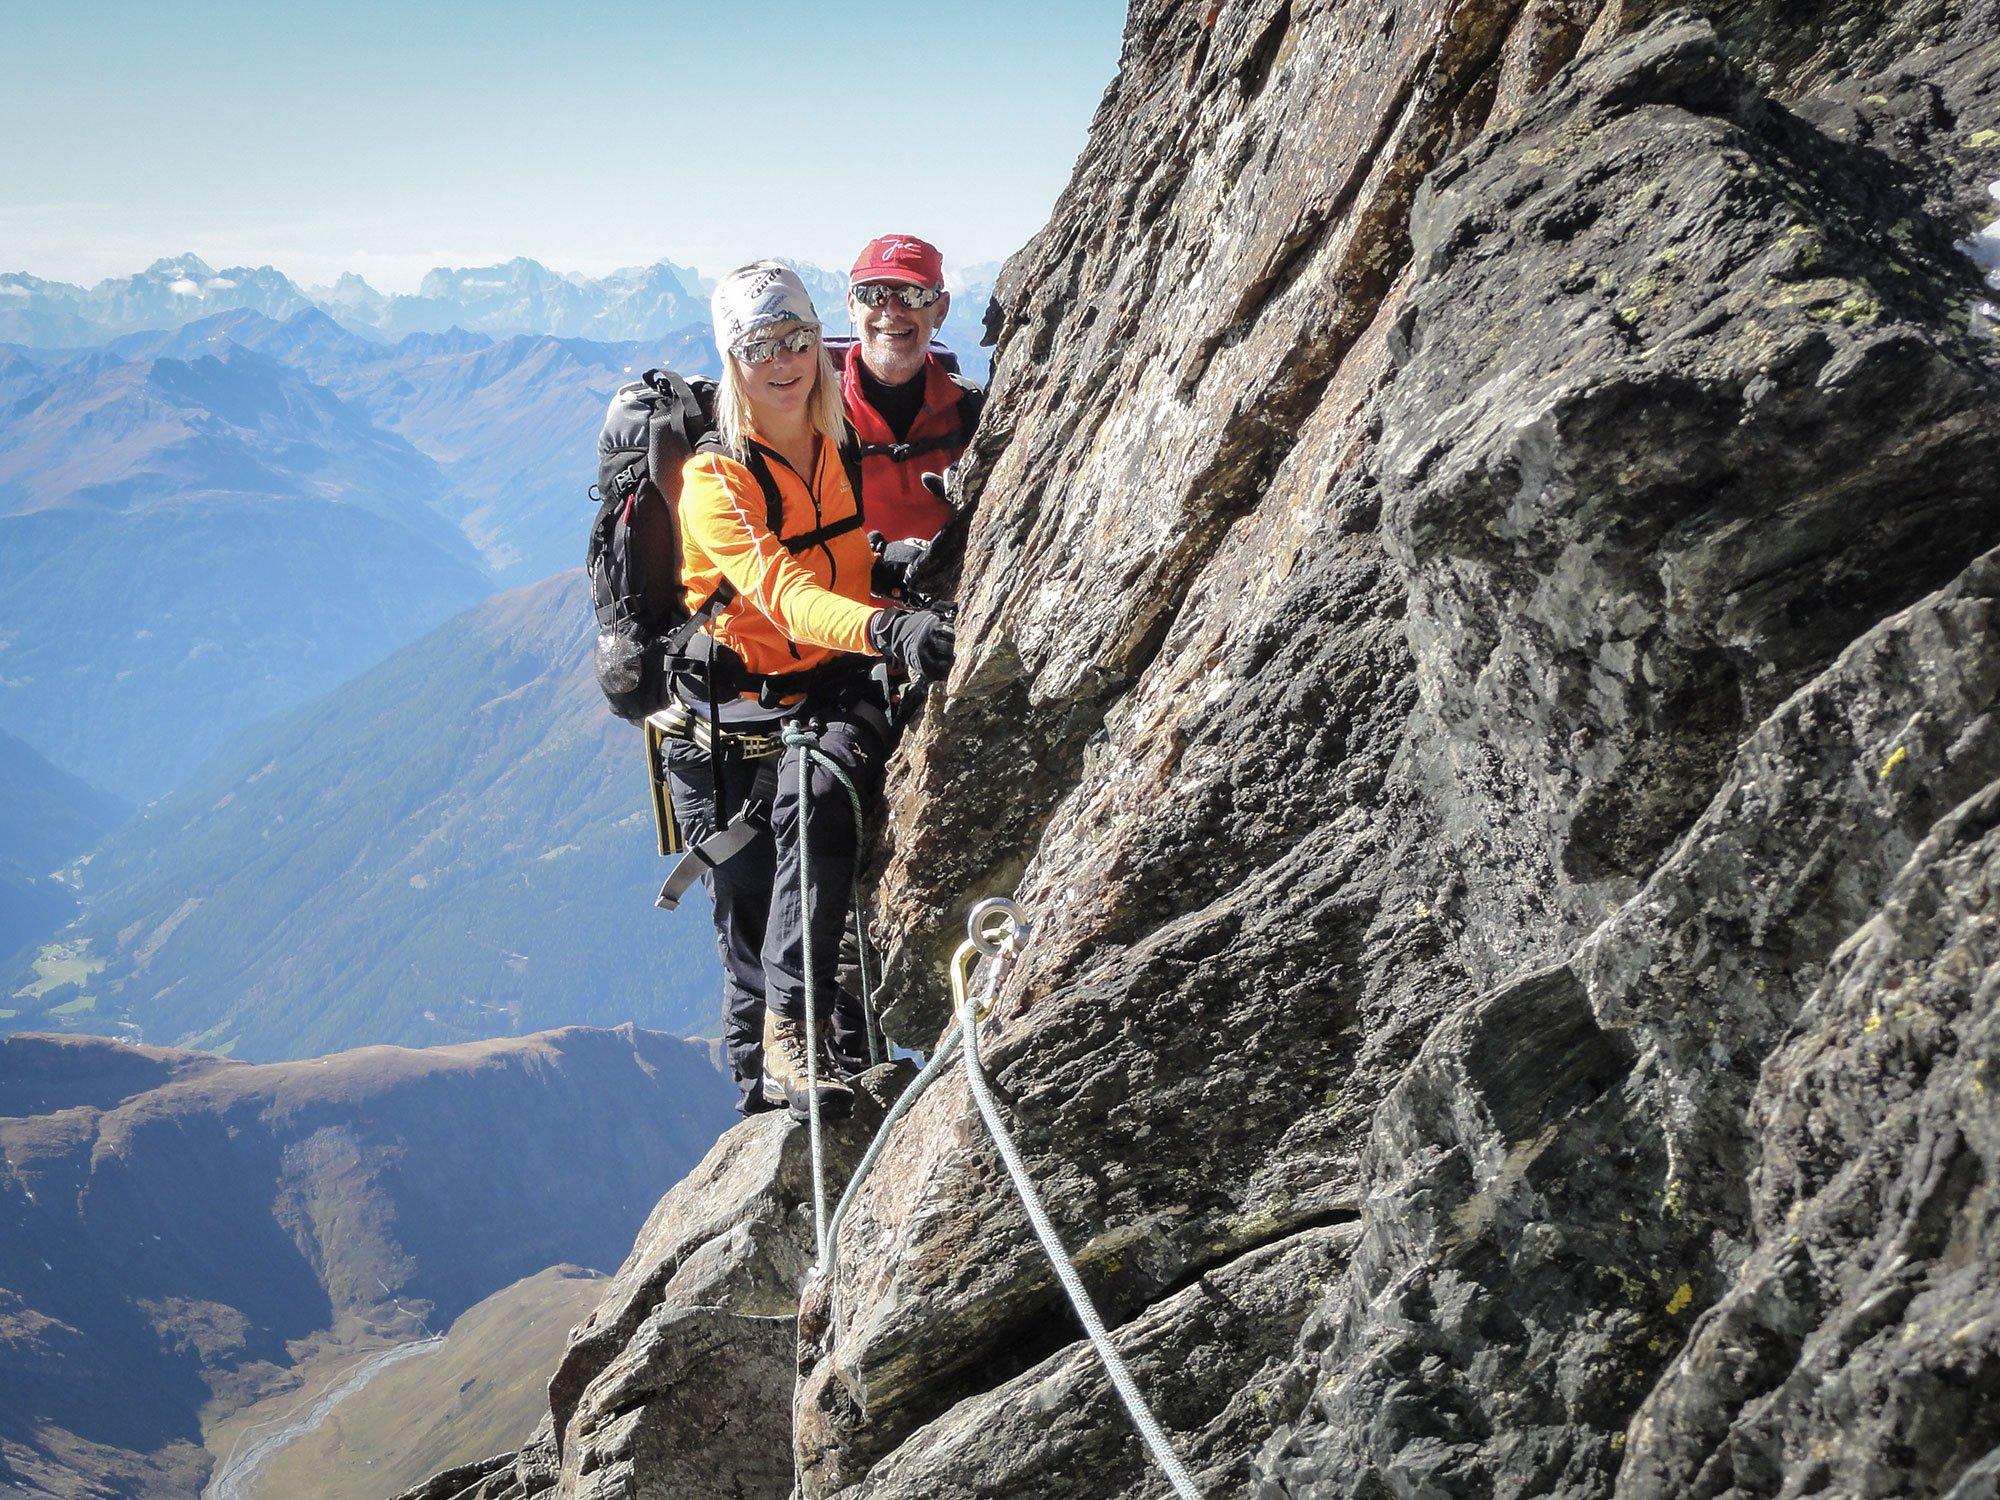 Klettersteig Oostenrijk : Klettern & klettersteige andreashanser